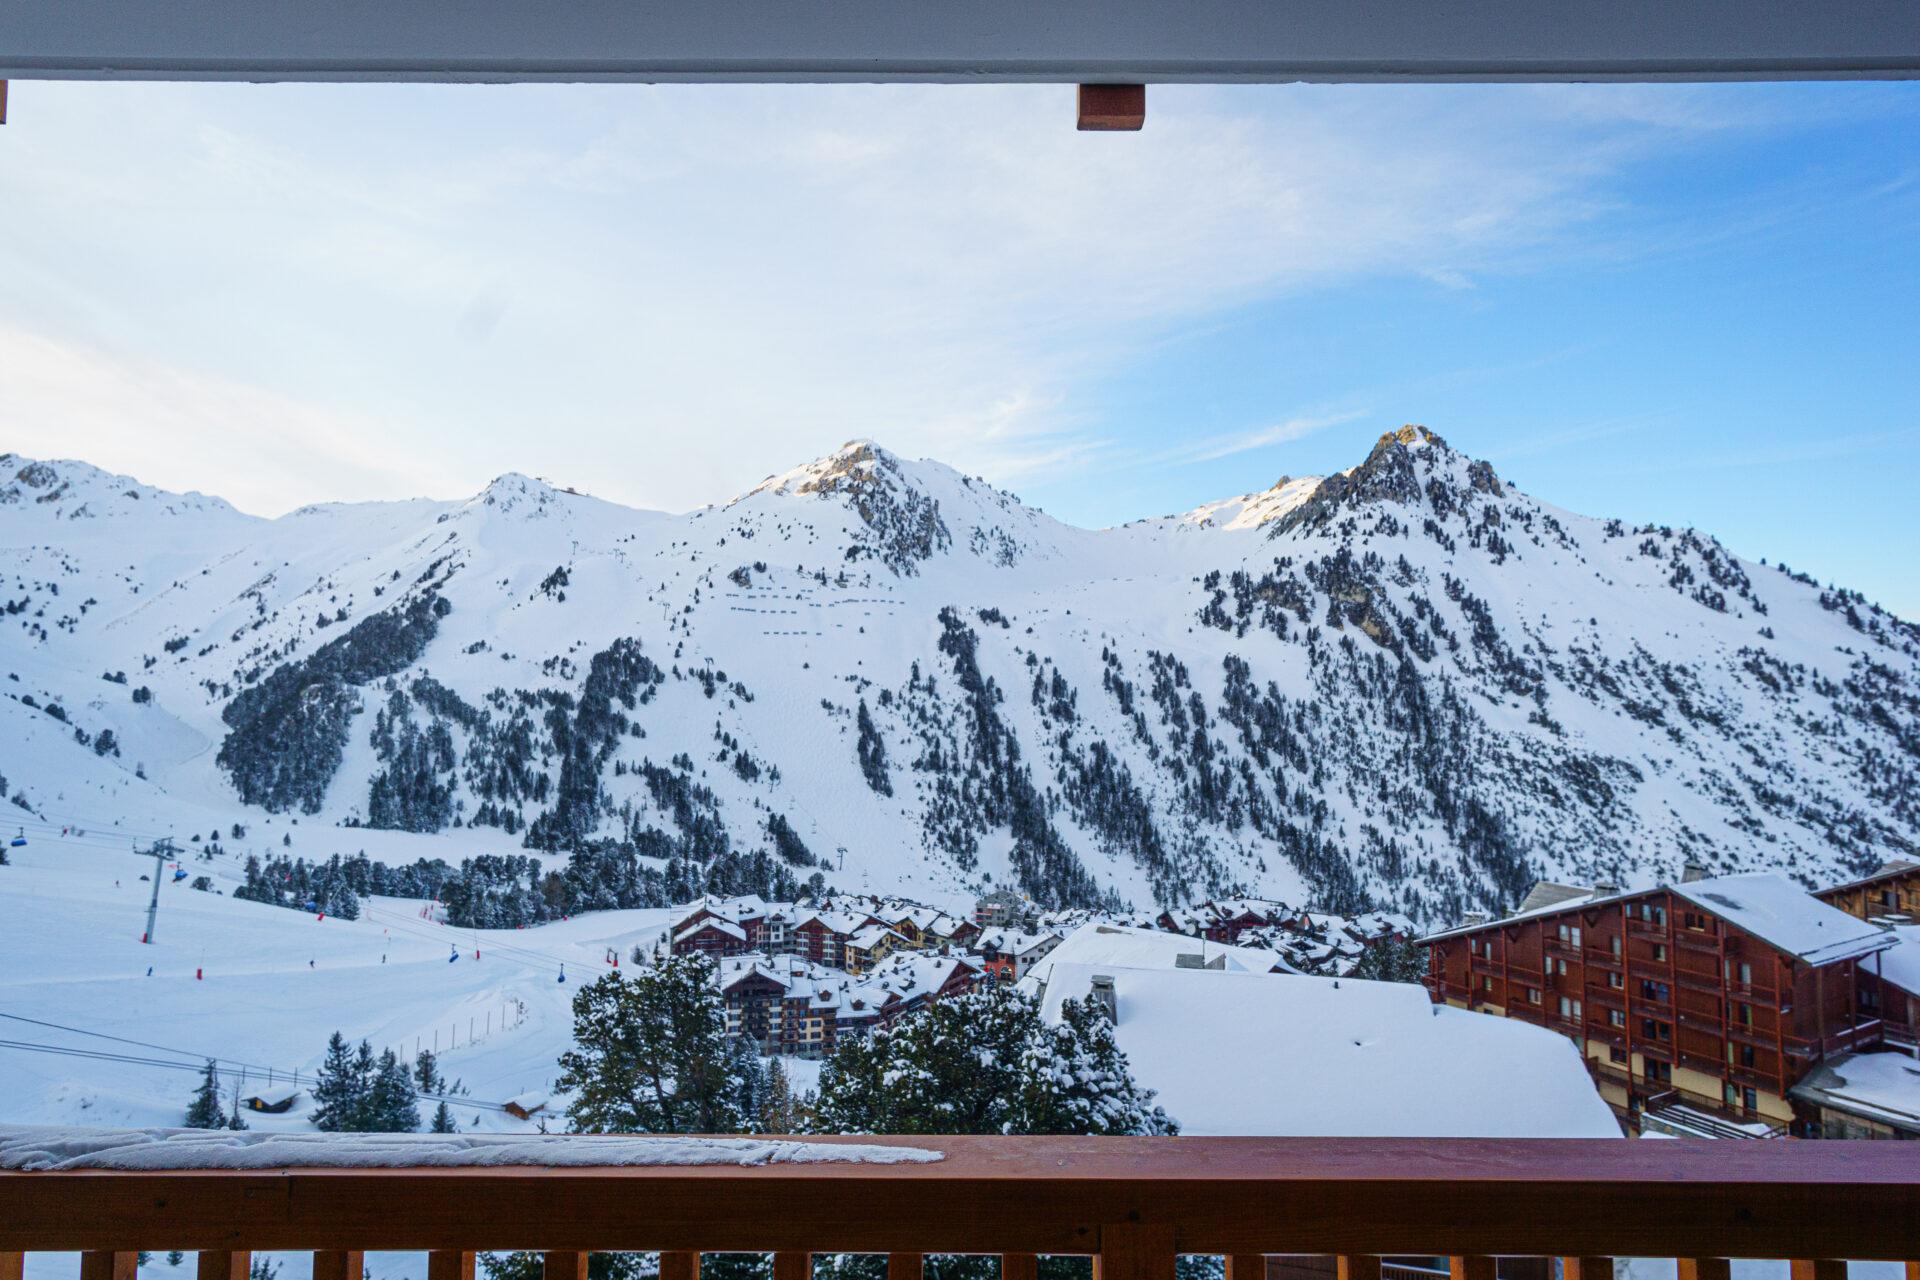 Perfect snowy mountain tops in Les Arcs, France, ecofriendly ski destination